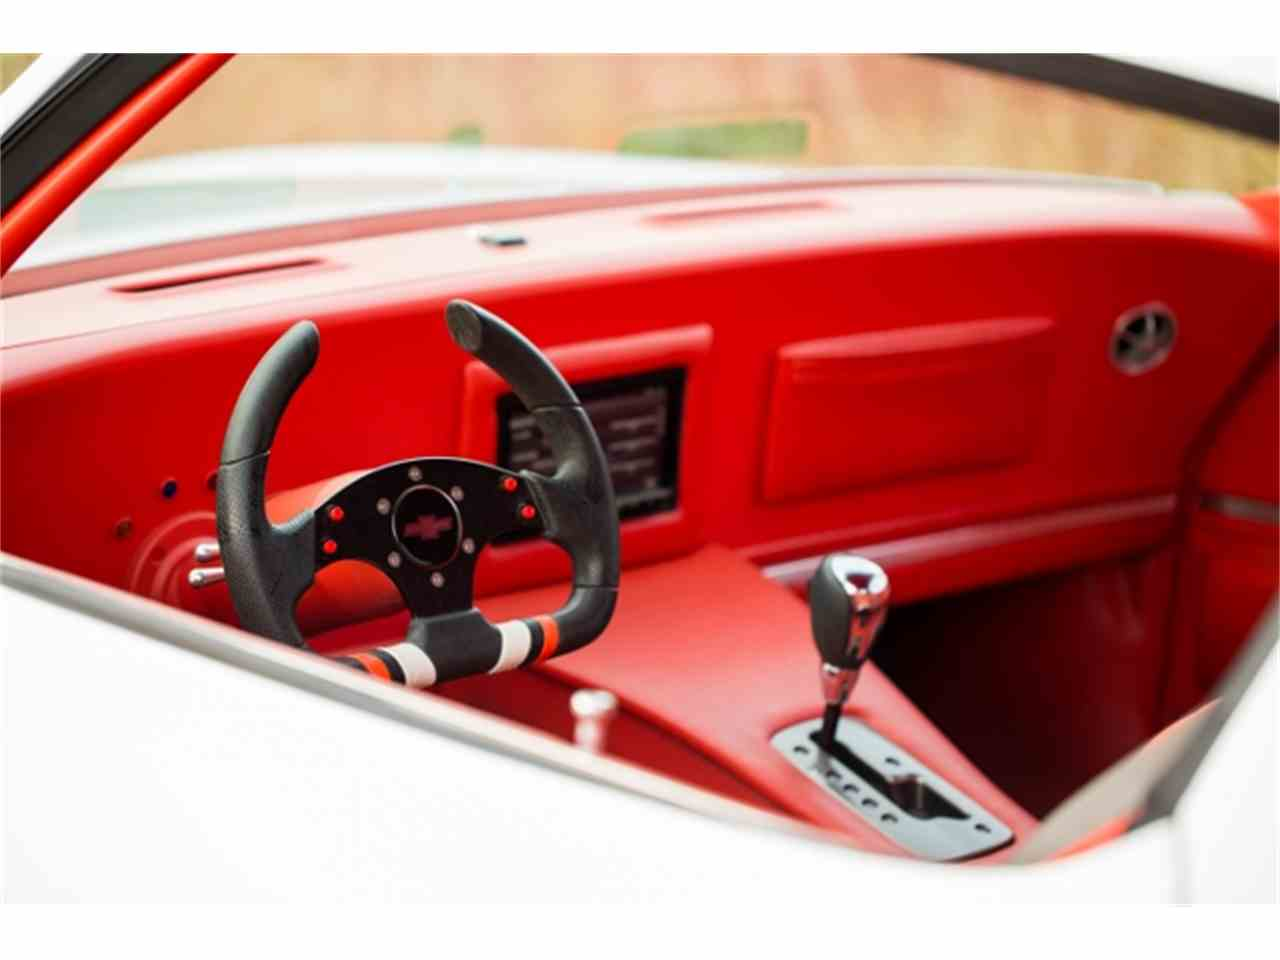 Large Picture of '70 Camaro - $99,900.00 - GGNI